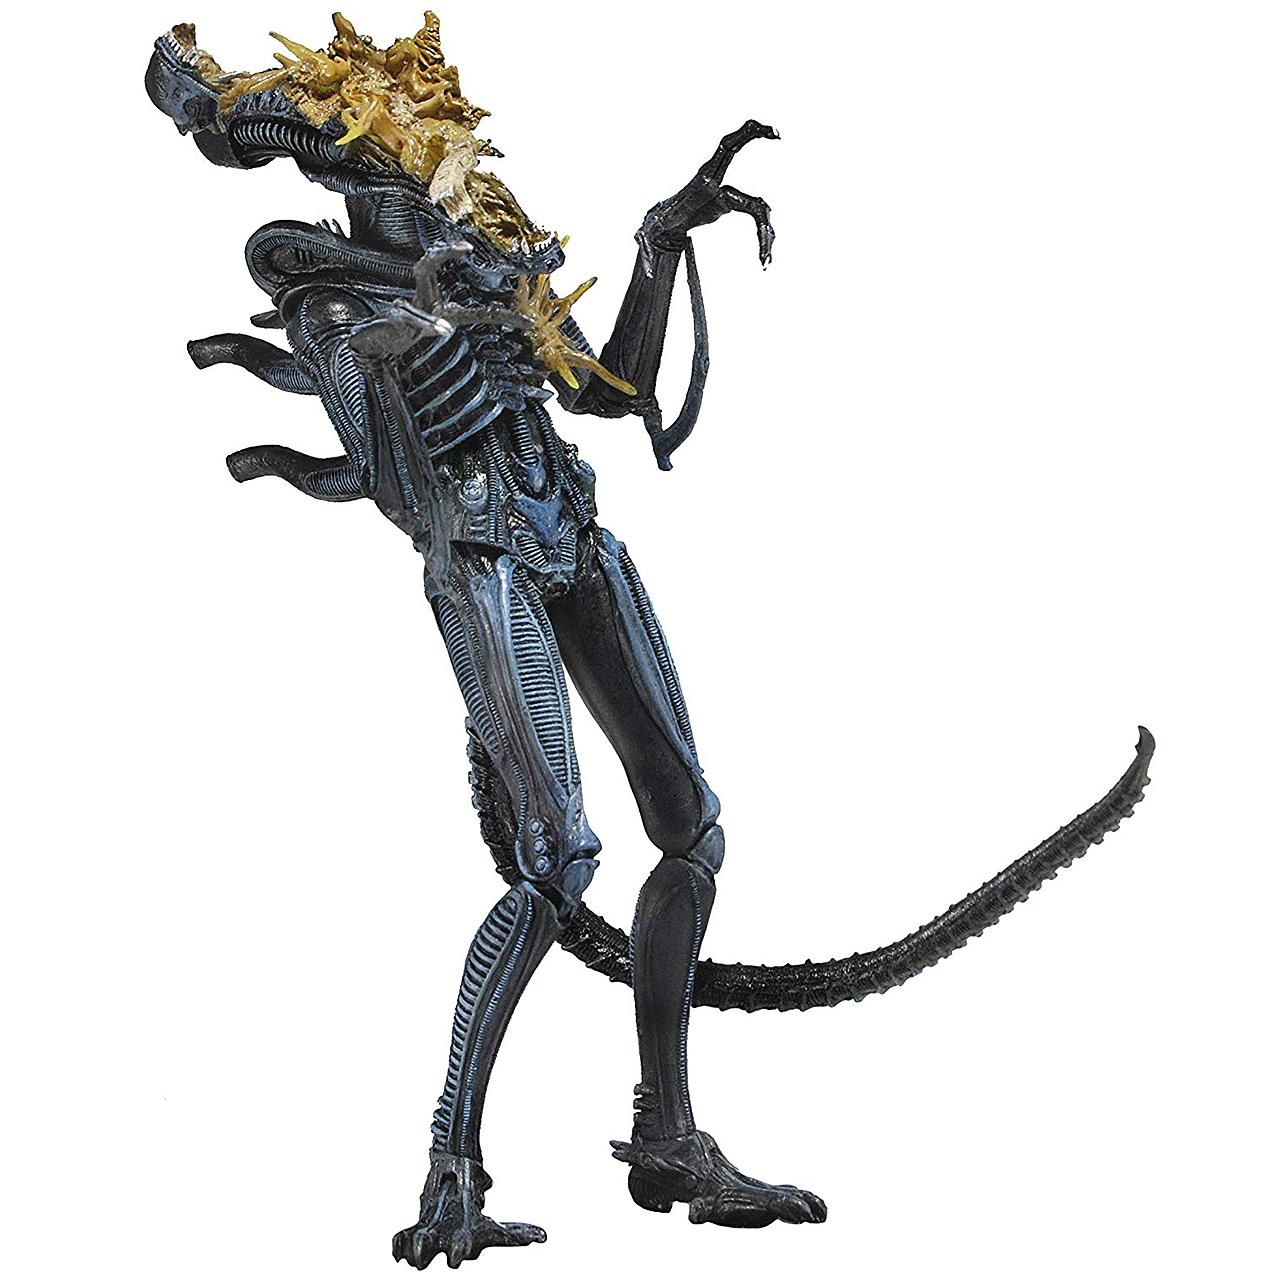 اکشن فیگور نکا سری Aliens مدل Aliens Xenomorph Warrior Battle Damage